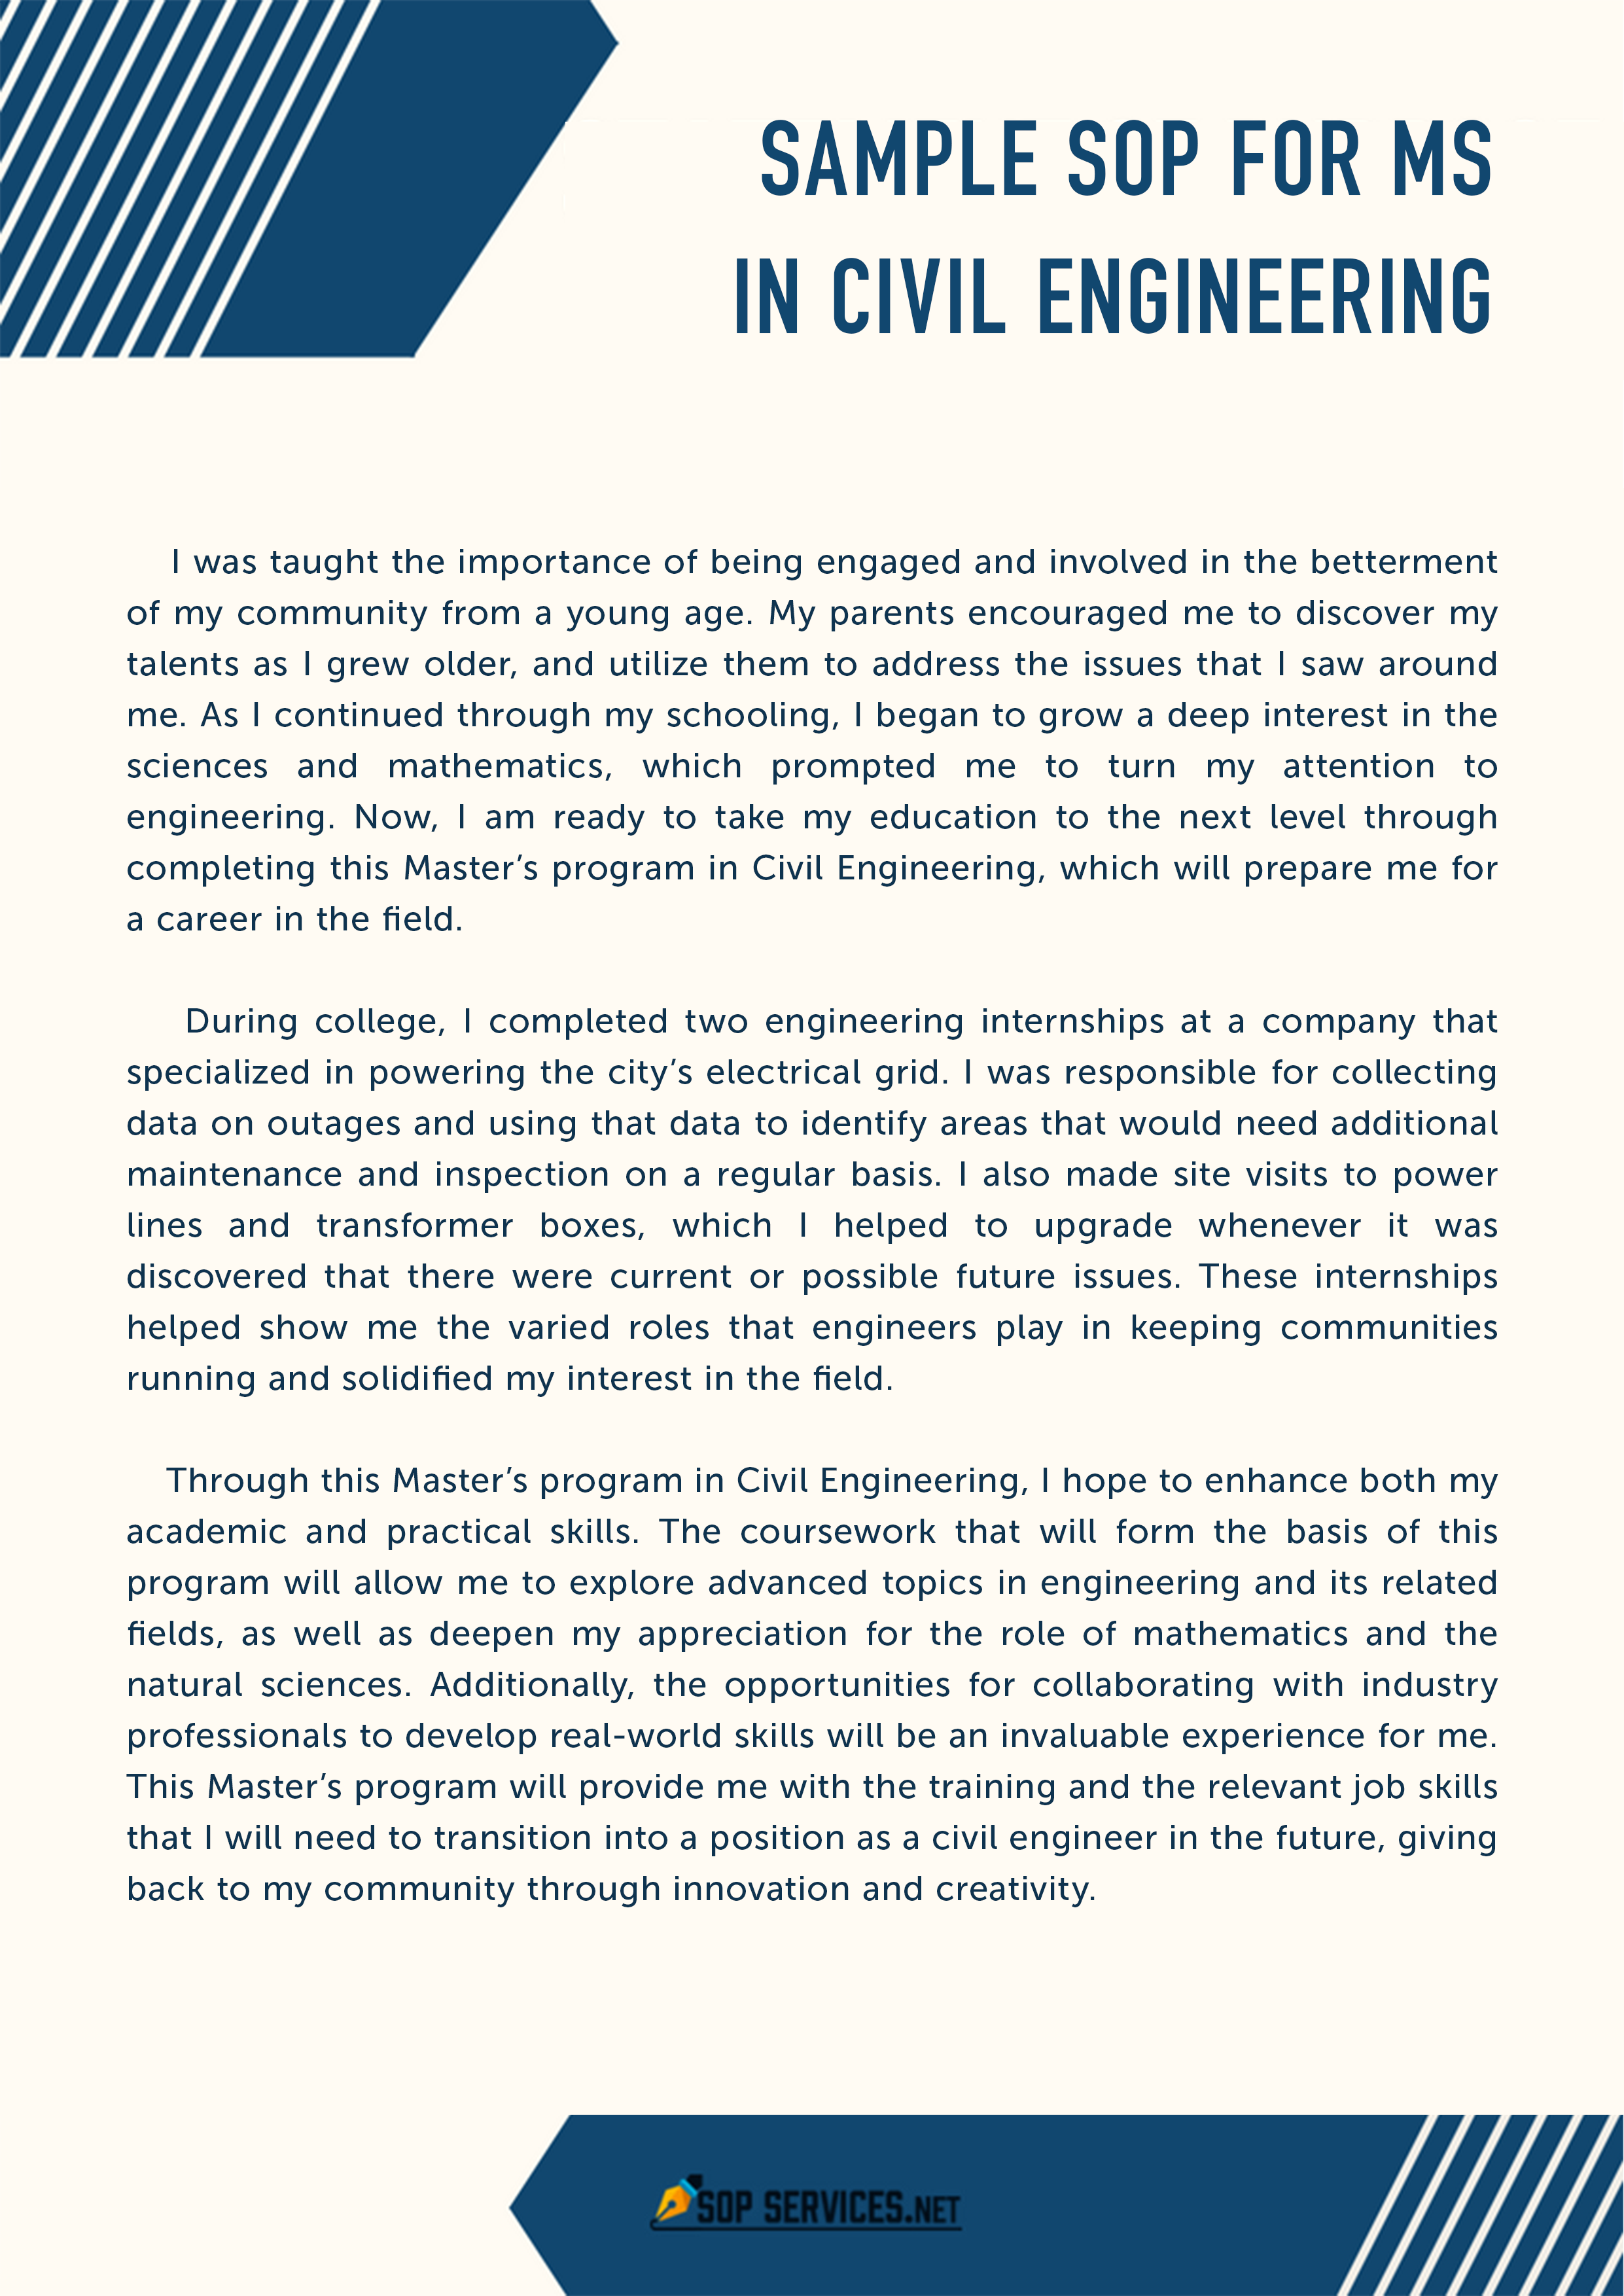 Get sample SOP for M's in civil engineering via this link